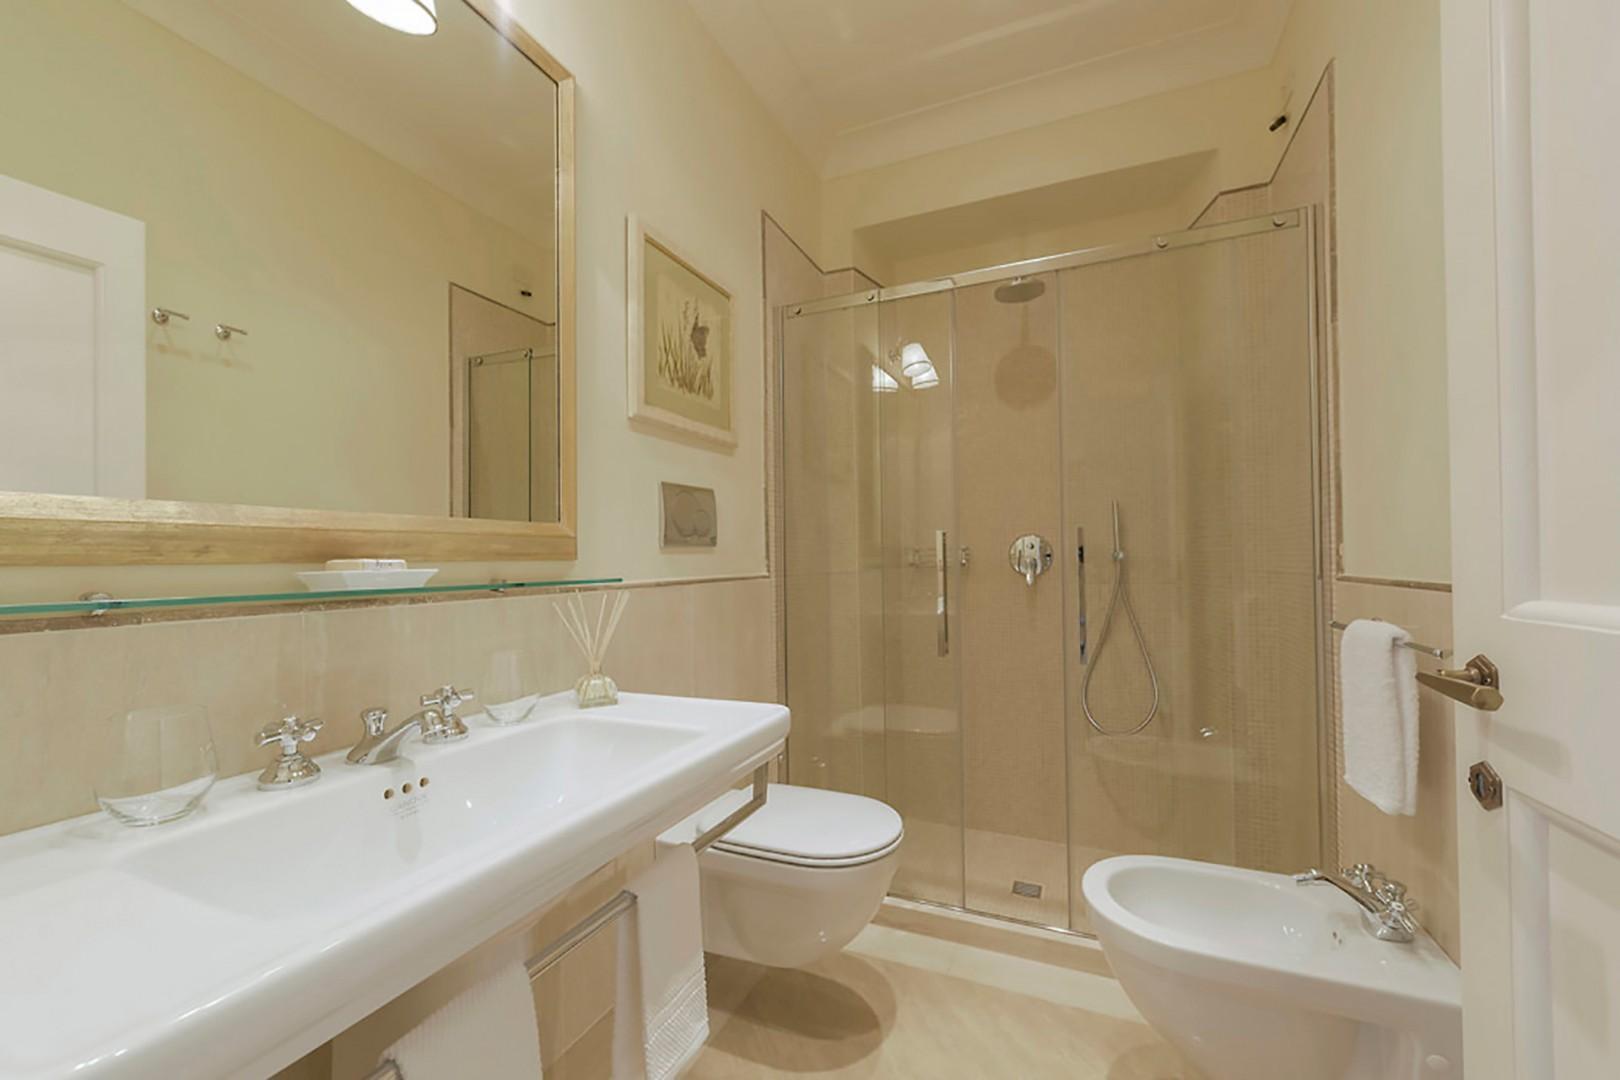 En suite bathroom 3 with large shower step-in shower.